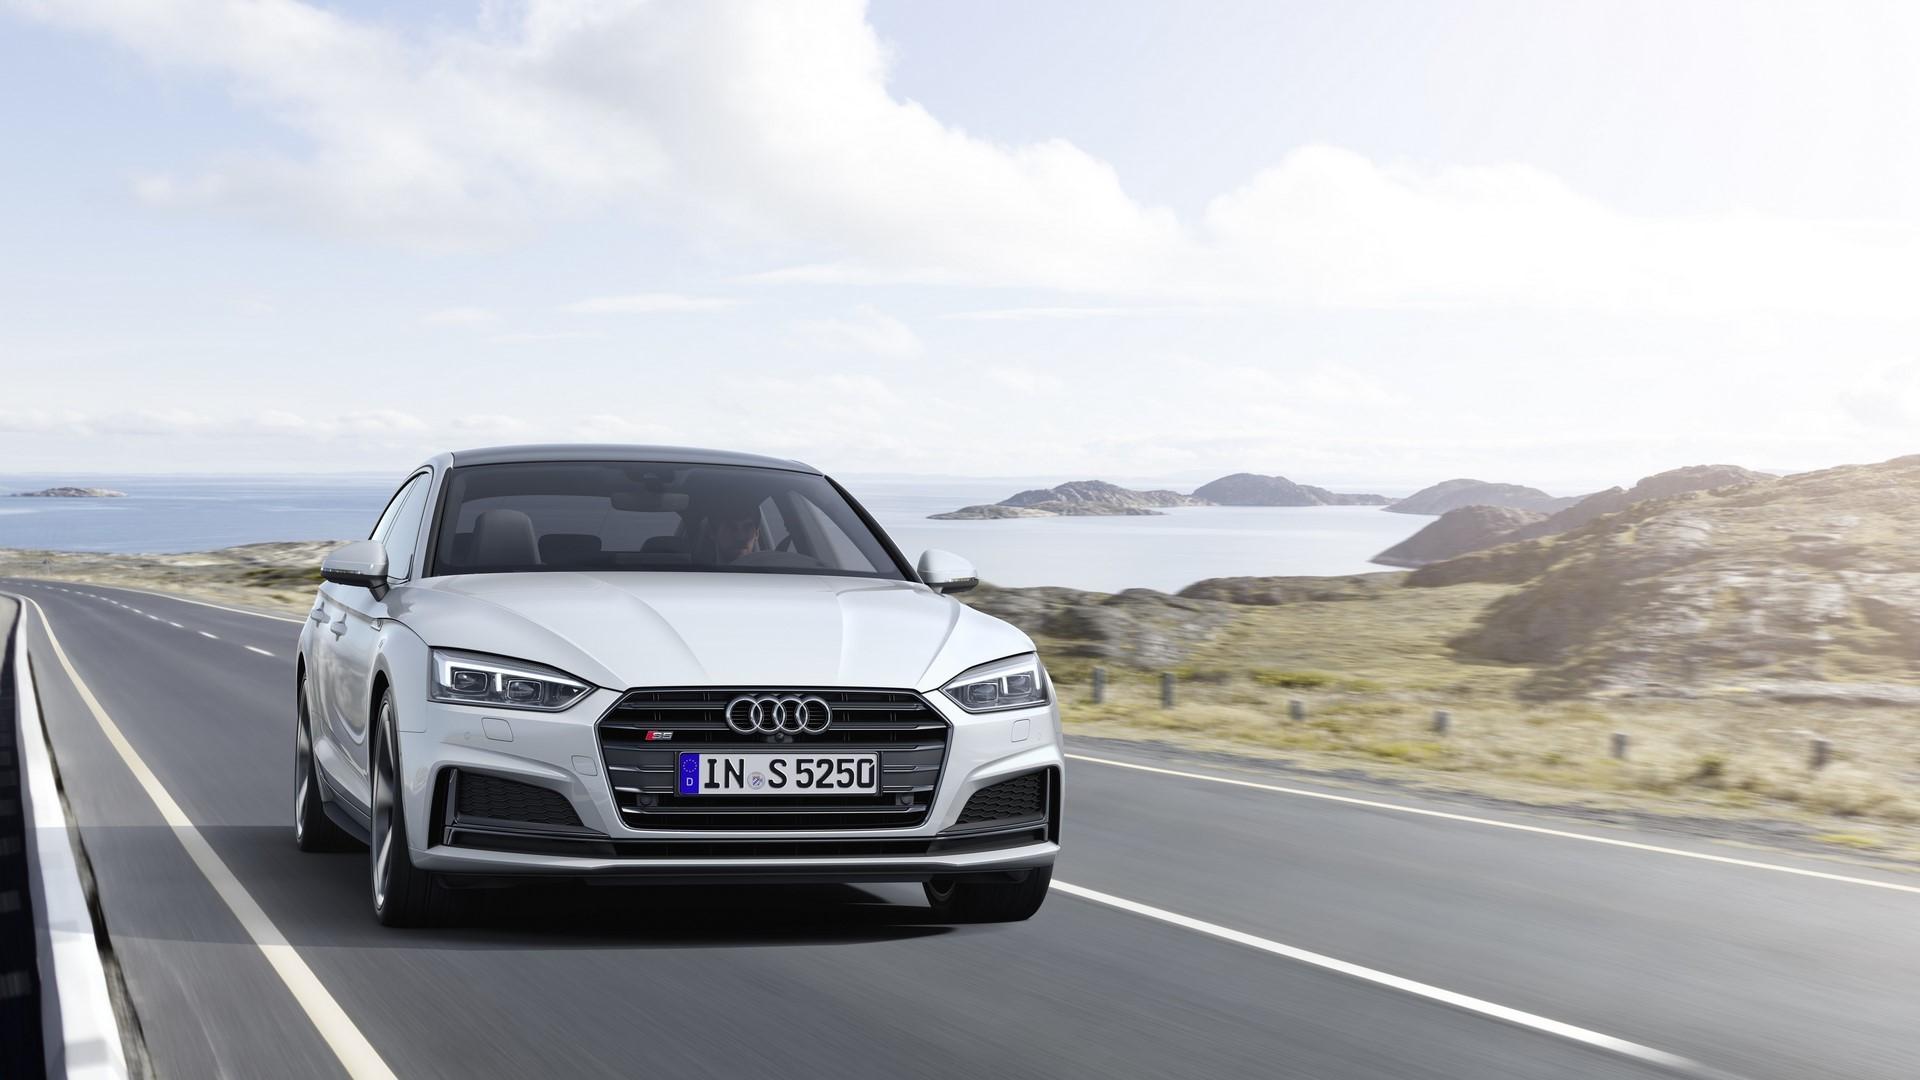 Audi-S5-TDI-Sportback-2